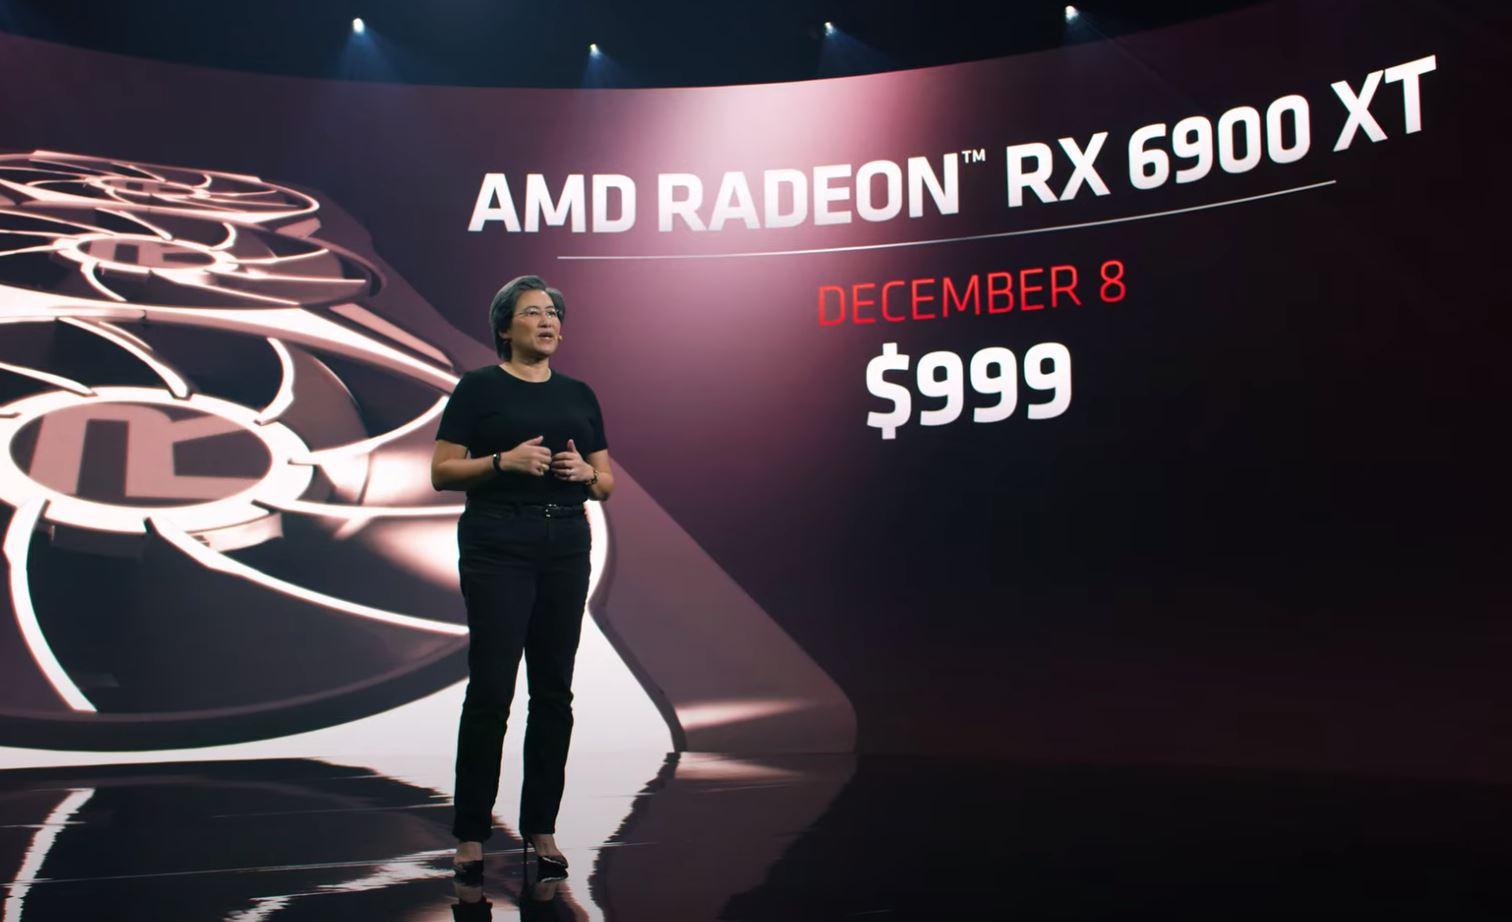 AMD Radeon RX 6900 XT Pricing